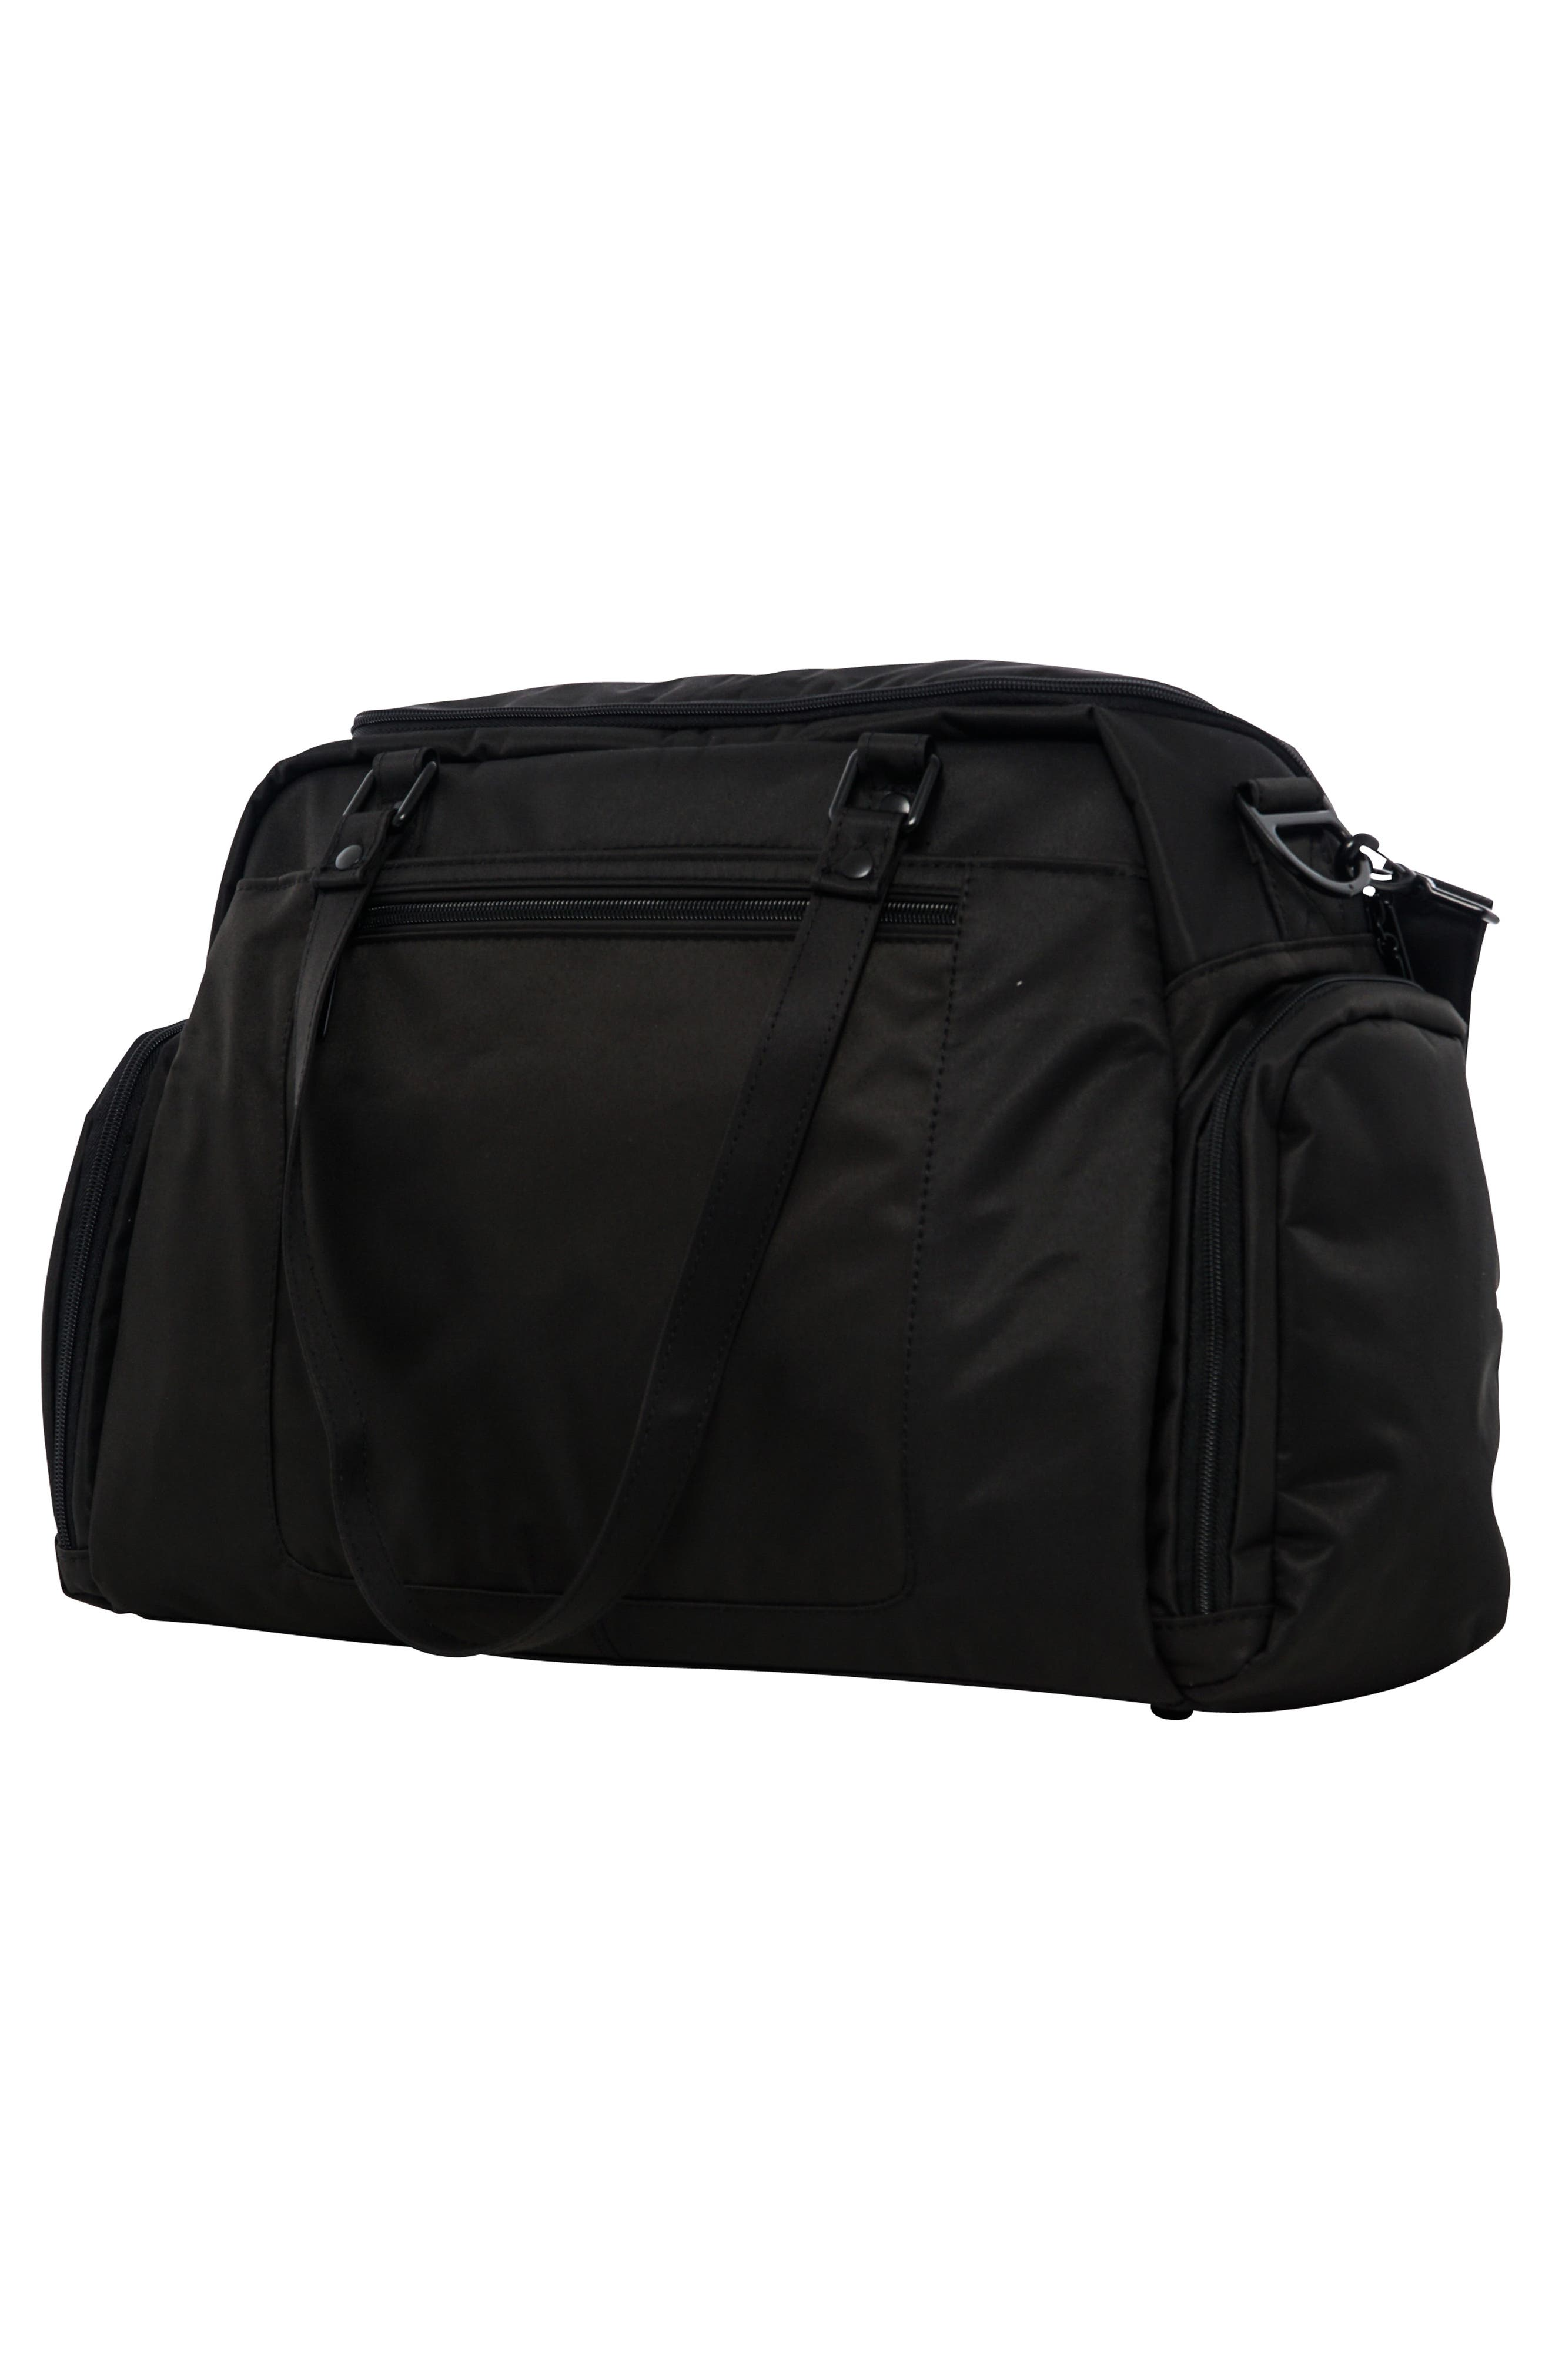 Onyx Be Pumped Bag,                             Alternate thumbnail 3, color,                             BLACK OUT